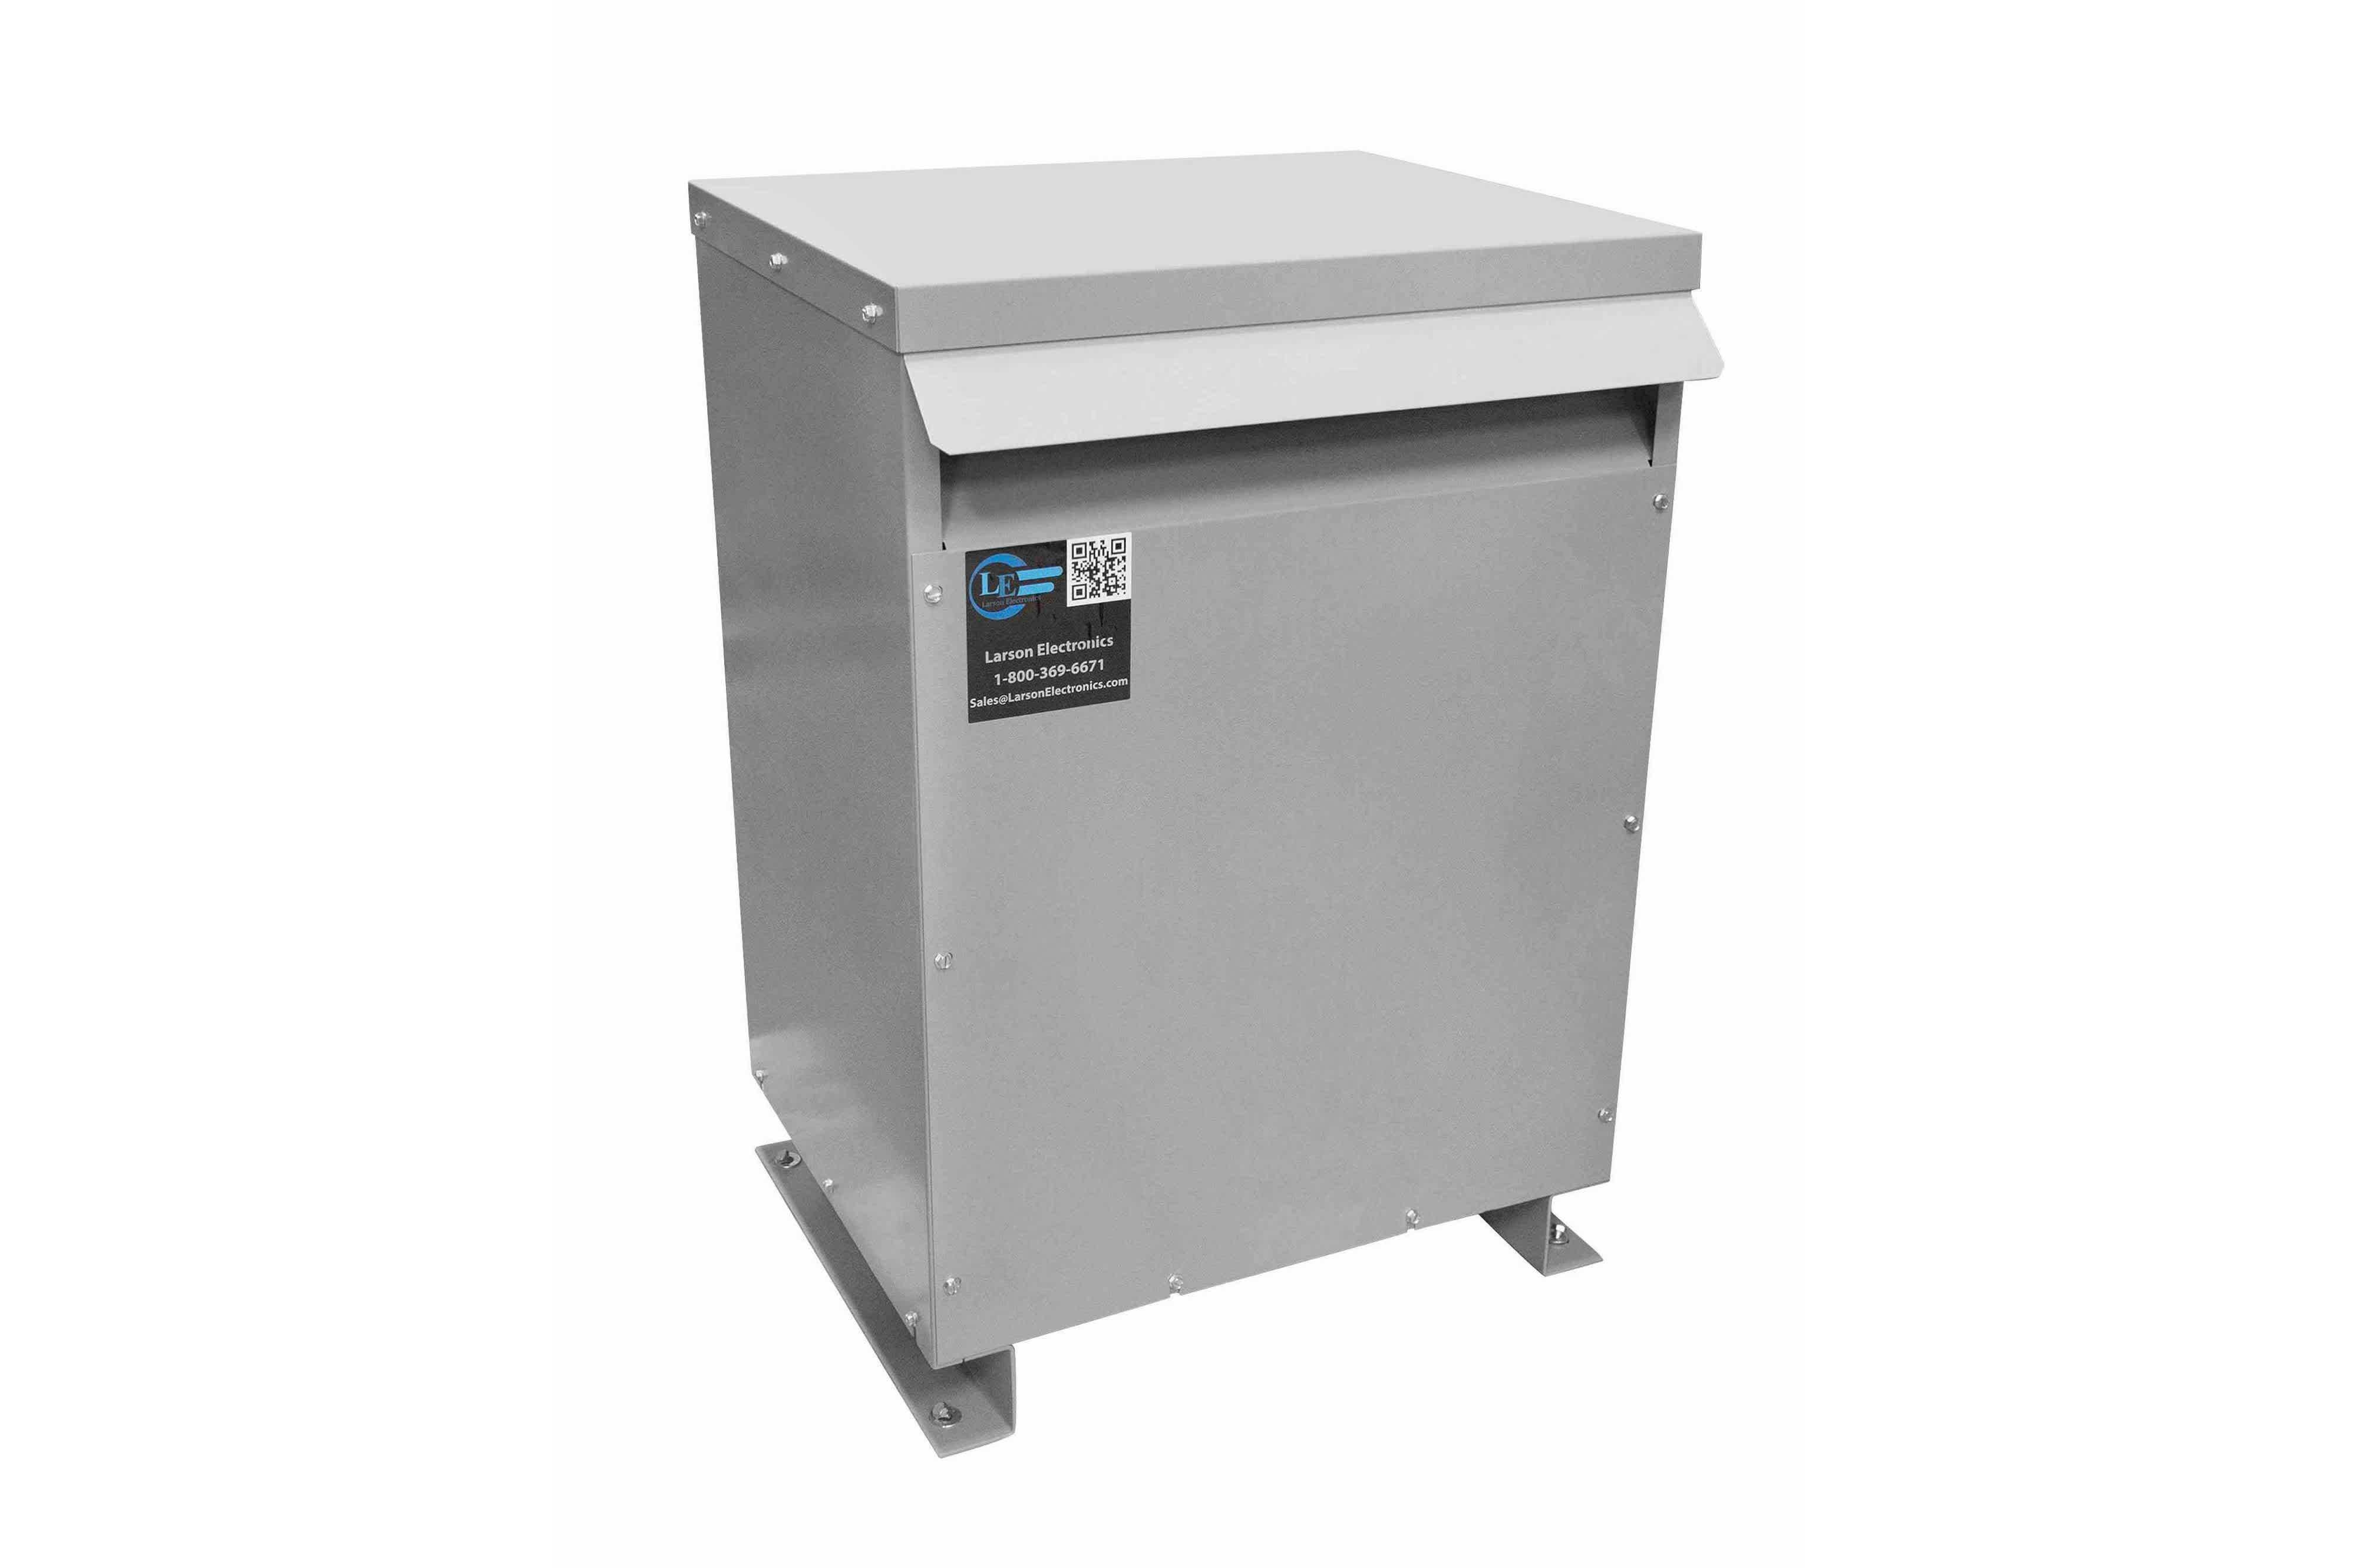 300 kVA 3PH Isolation Transformer, 460V Wye Primary, 415V Delta Secondary, N3R, Ventilated, 60 Hz